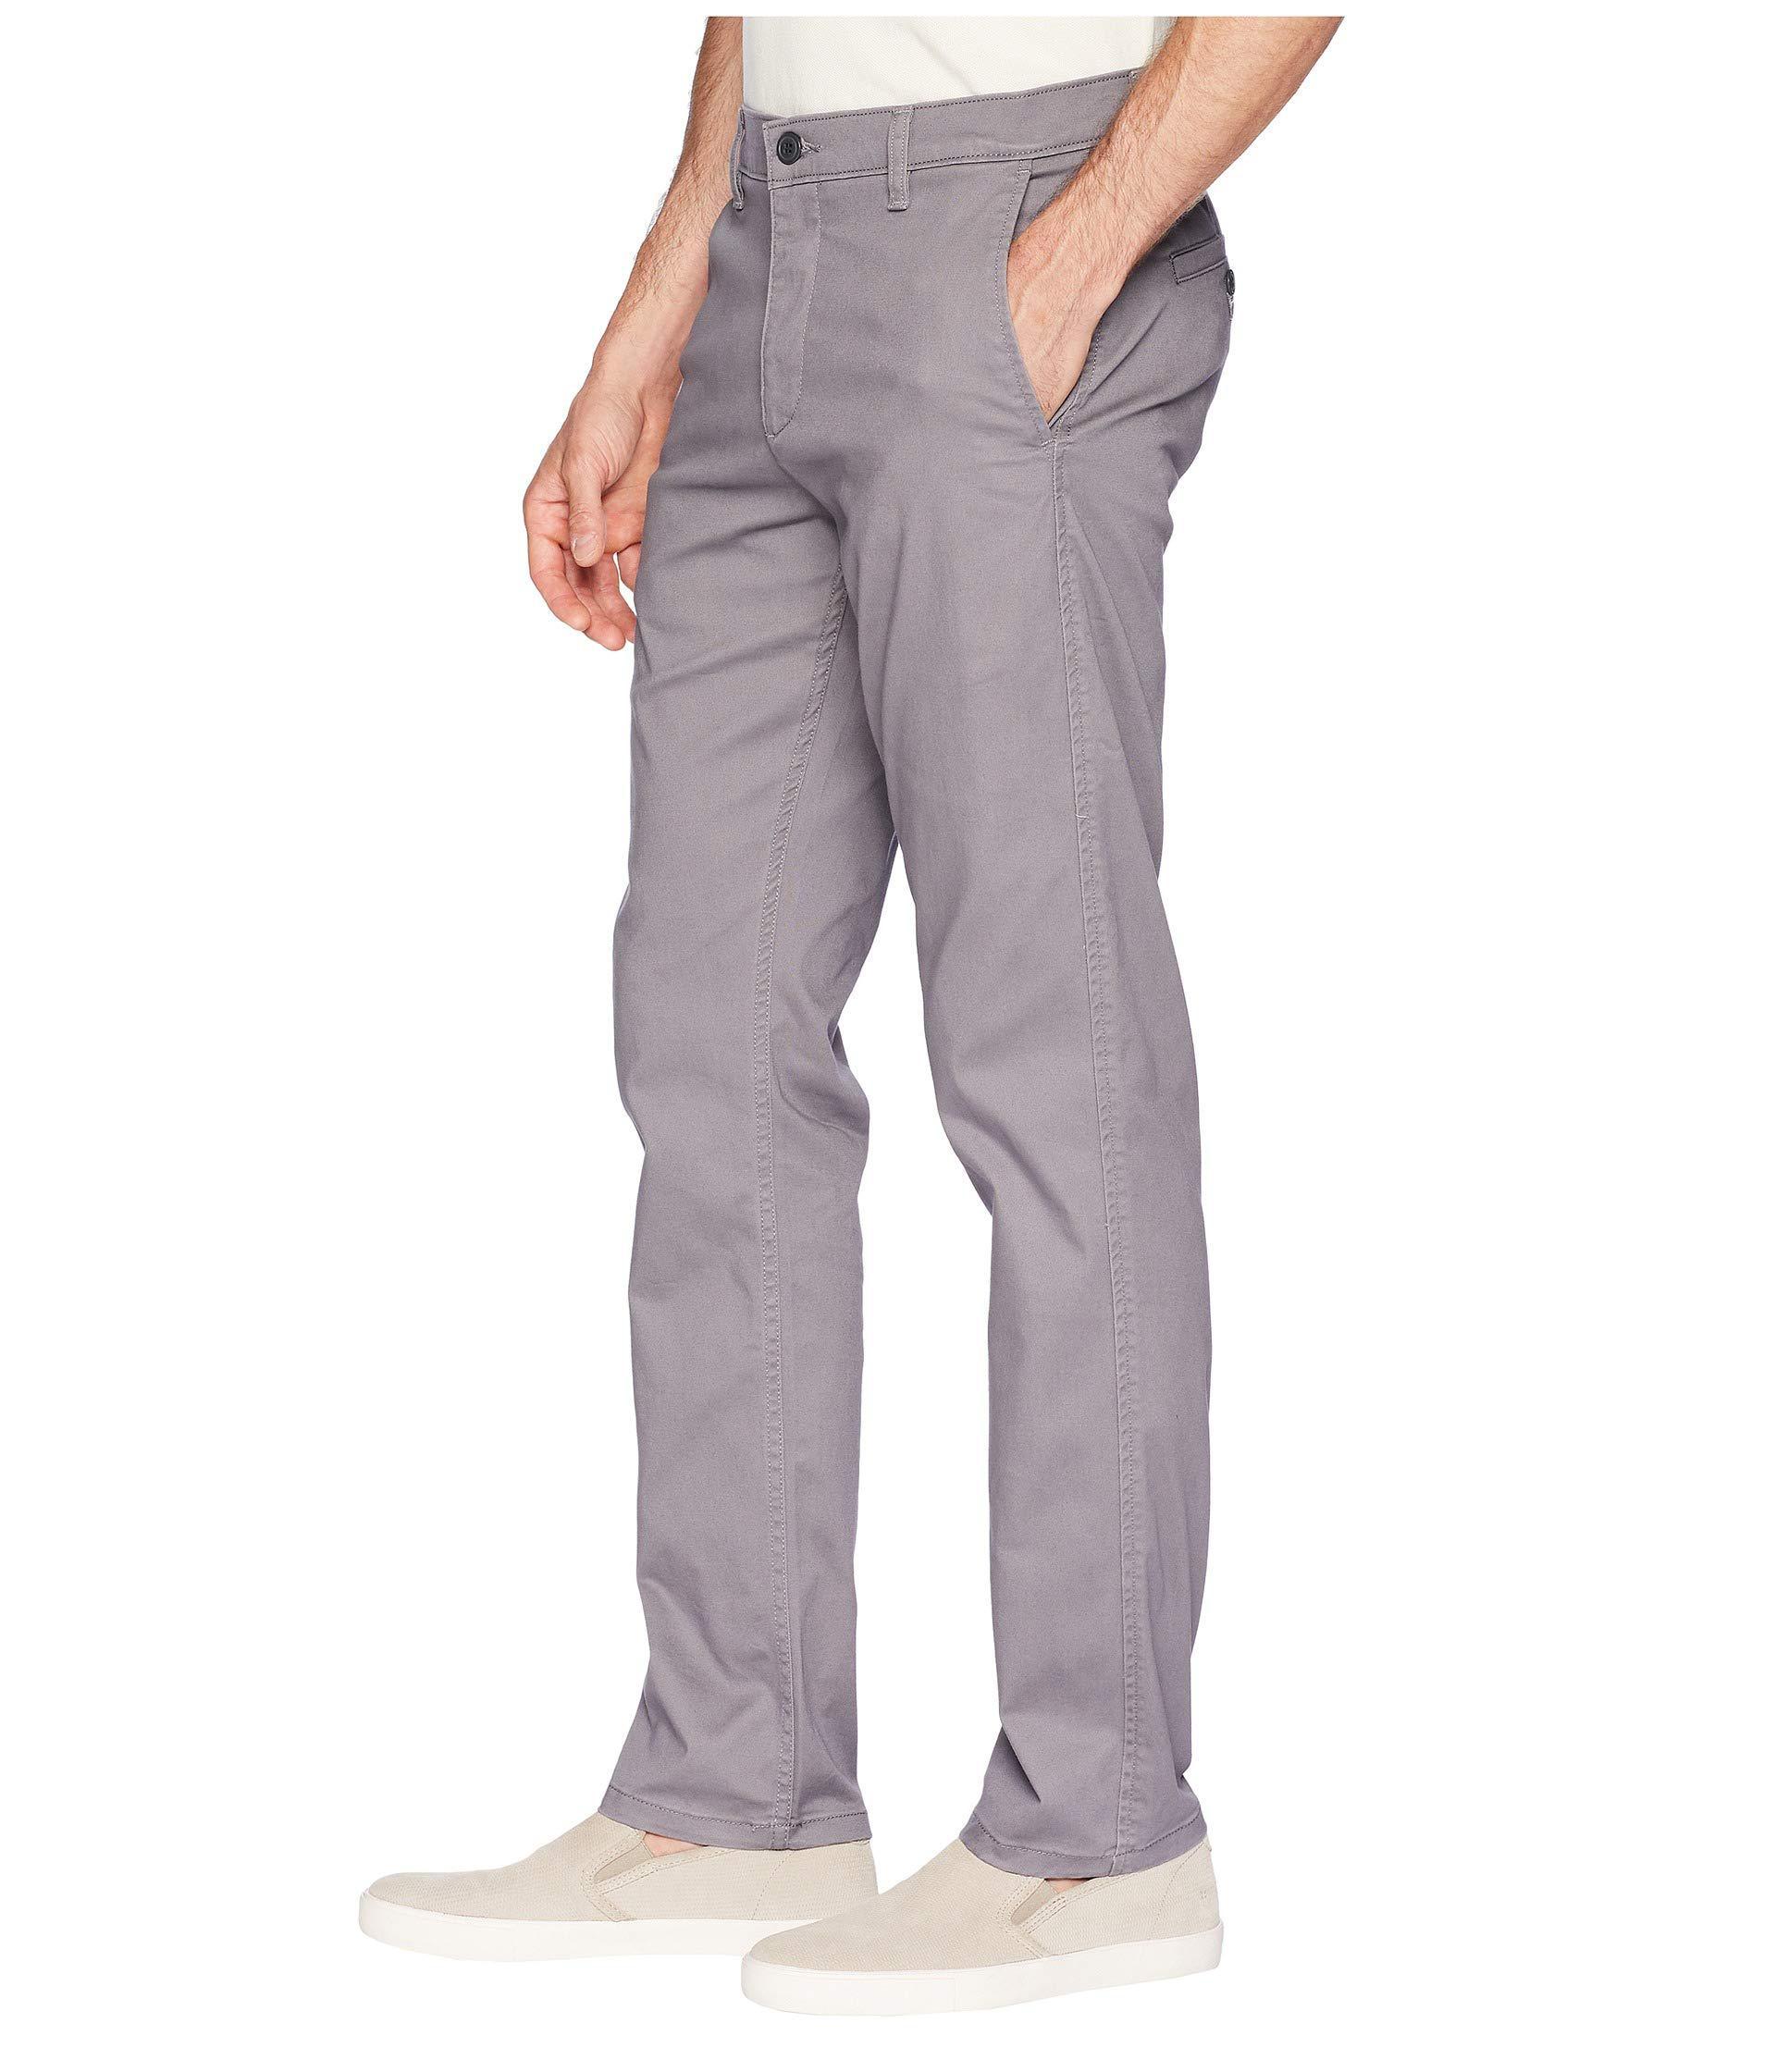 9b3d14f75a1ec8 Lyst - Dockers Straight Fit Signature Khaki Lux Cotton Stretch Pants D2 -  Creaseless (new British Khaki) Men s Casual Pants in Natural for Men